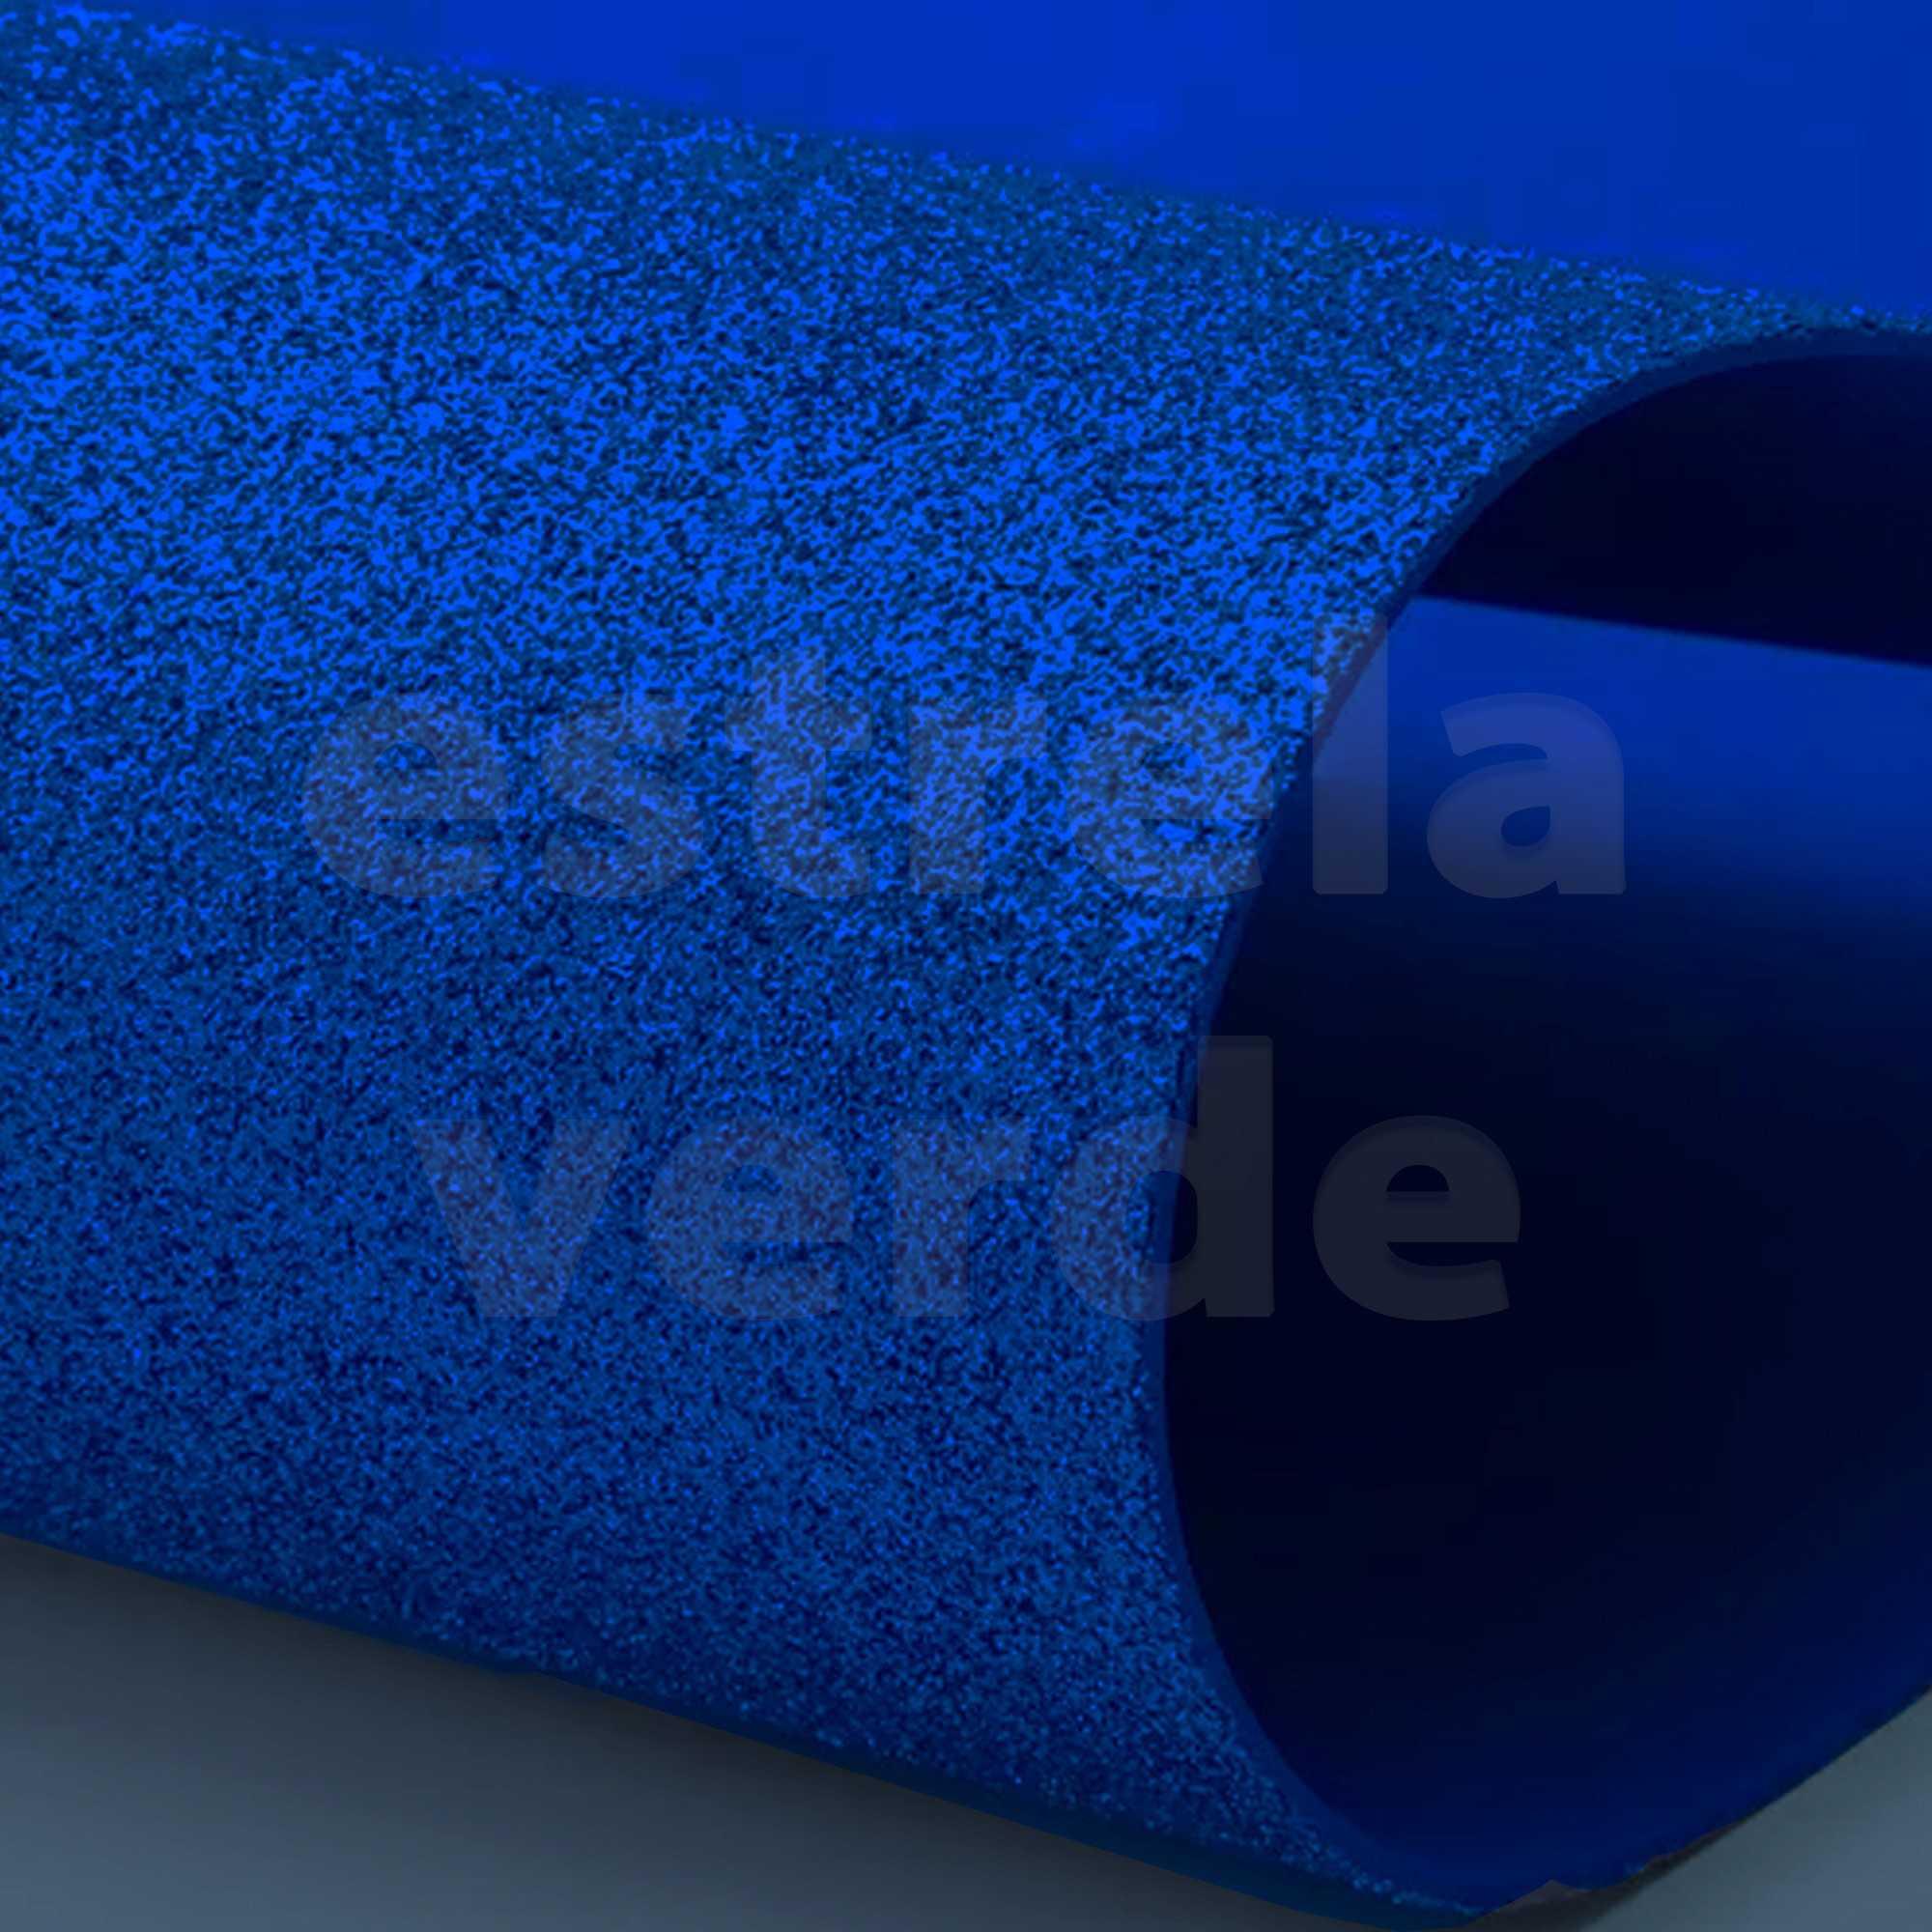 EVA GLITTER 40X60 AZUL ROYAL 2MM  - Estrela Verde